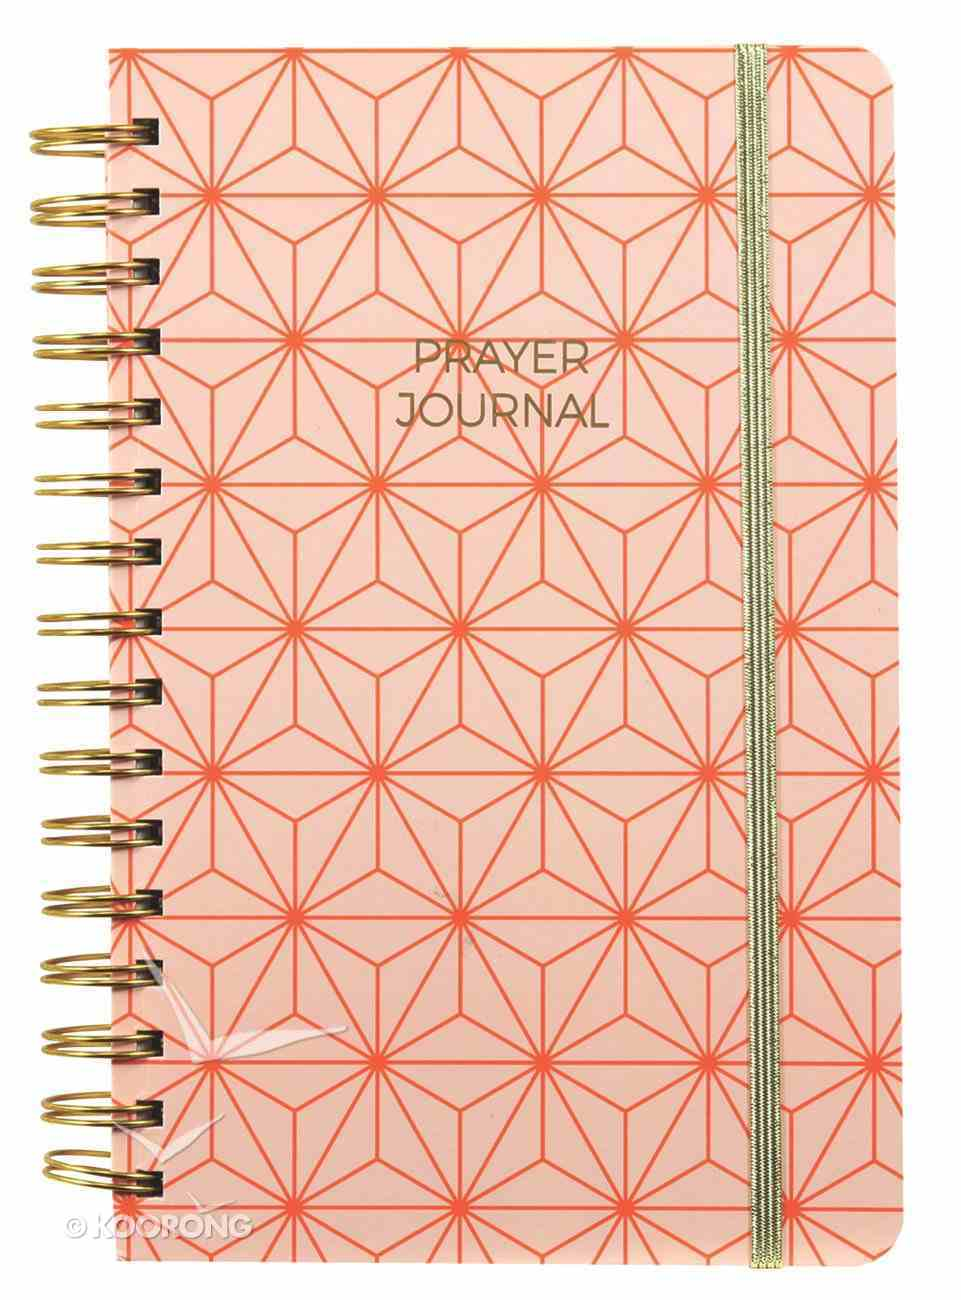 Prayer Journal: One Year Weekly Layout (Orange Geometric Design) Spiral